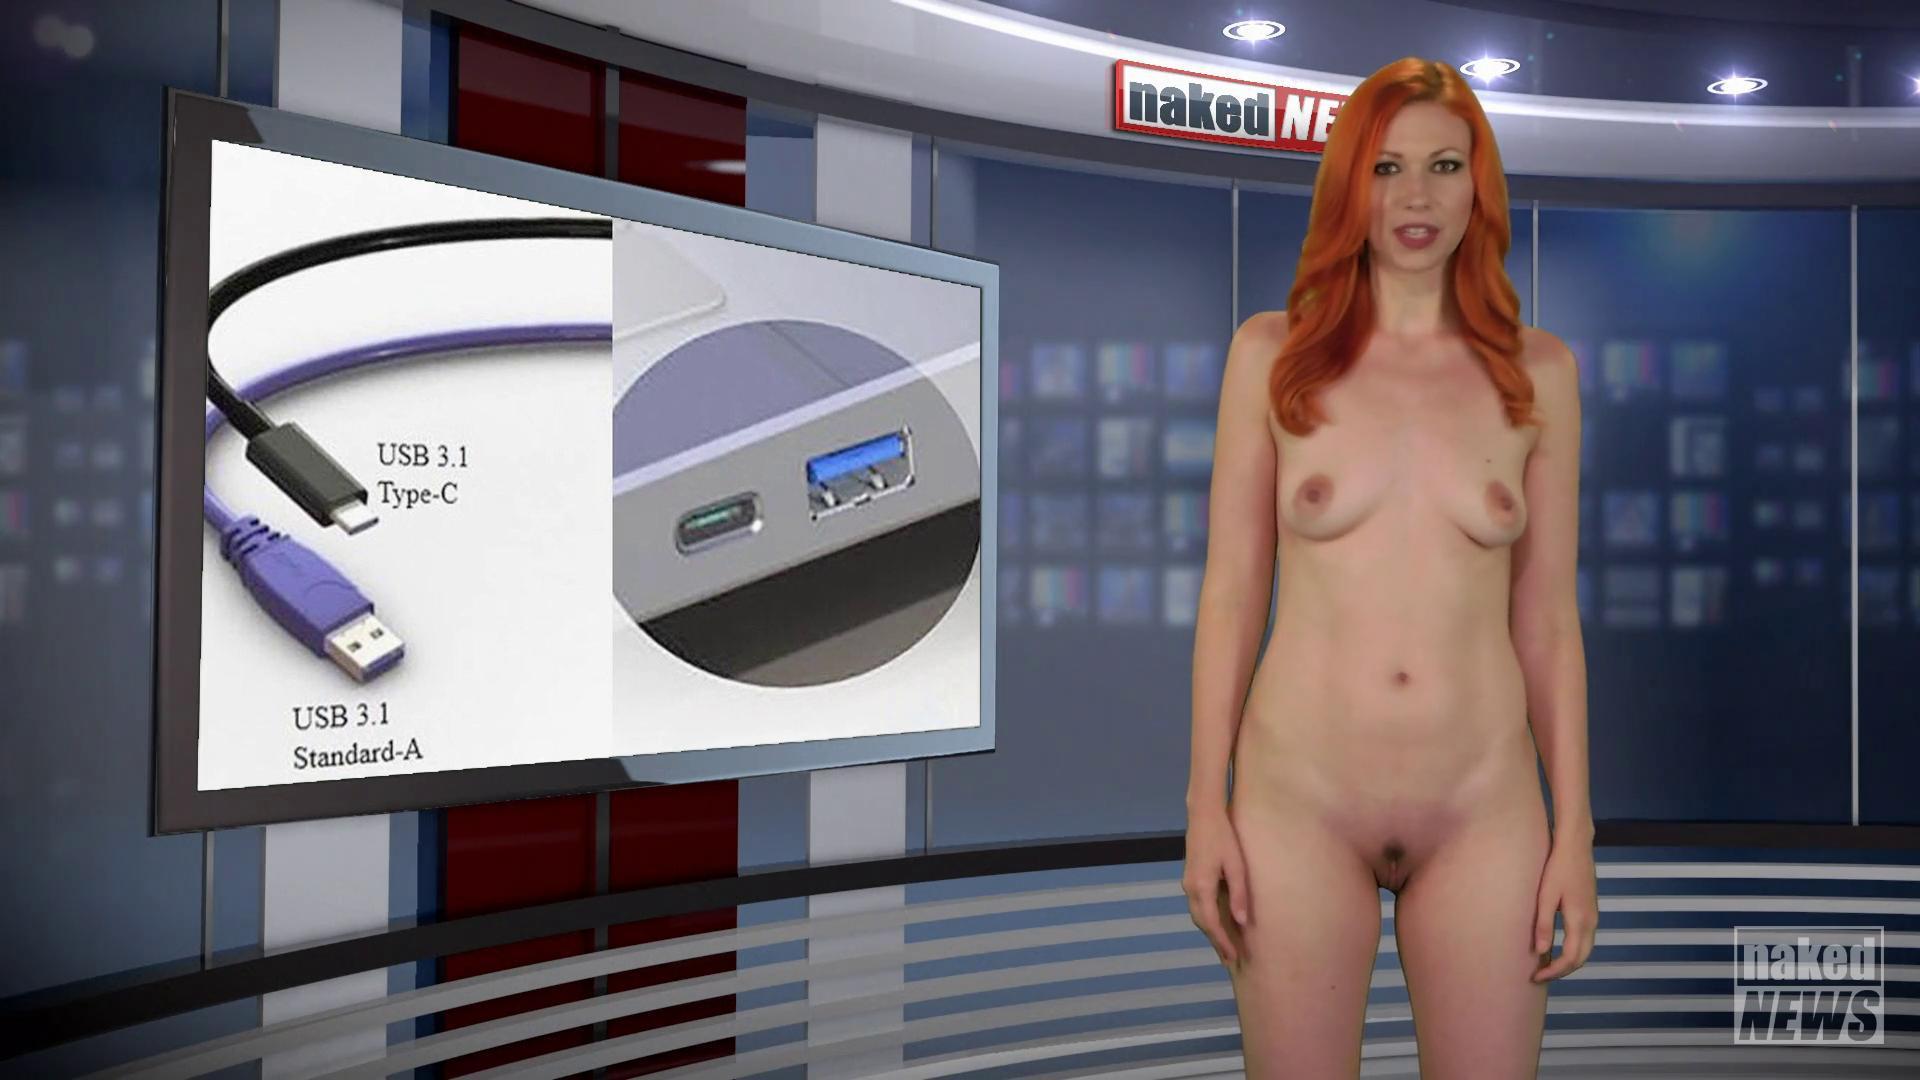 Naked technology boyfriend naked pics